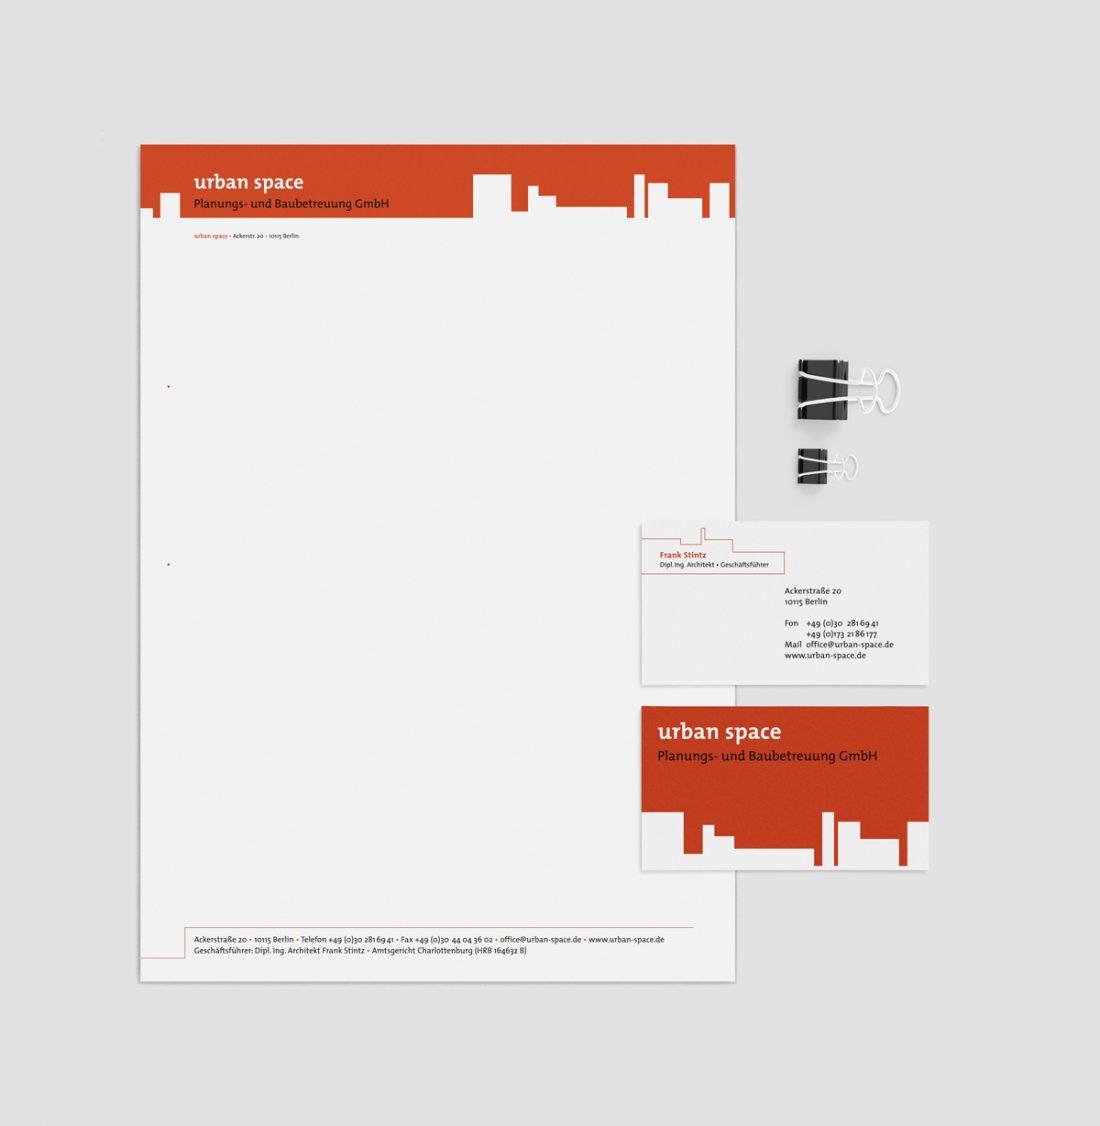 Illustration, logoentwicklung, geschäftsausstattung, vistenkarten, briefpapier, flyer, grafikdesign, Heike Börner